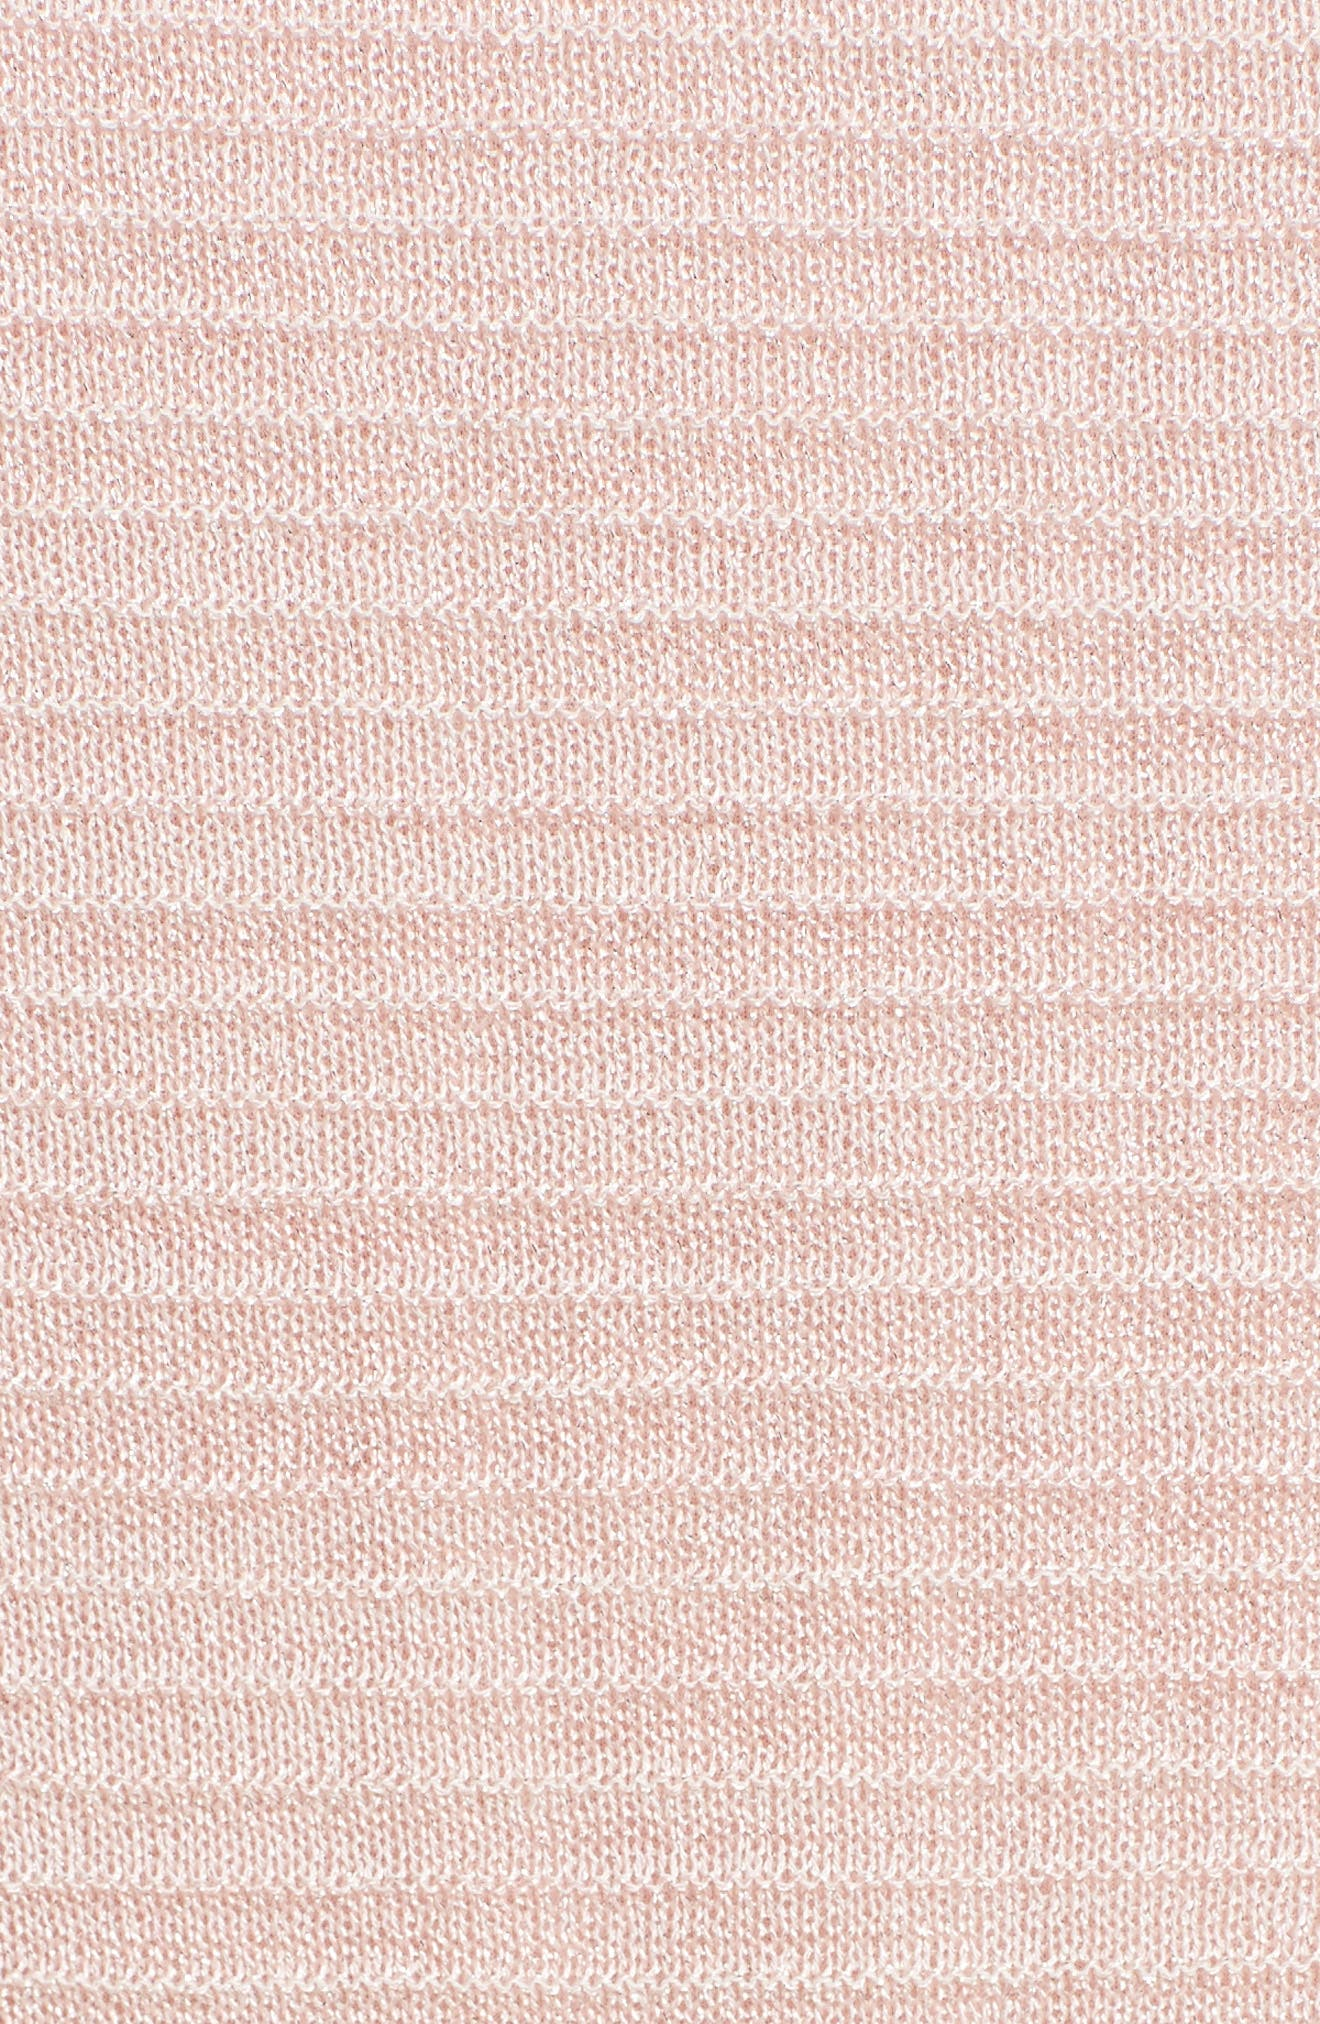 Ruffle Metallic Mouline Knit Dress,                             Alternate thumbnail 5, color,                             661